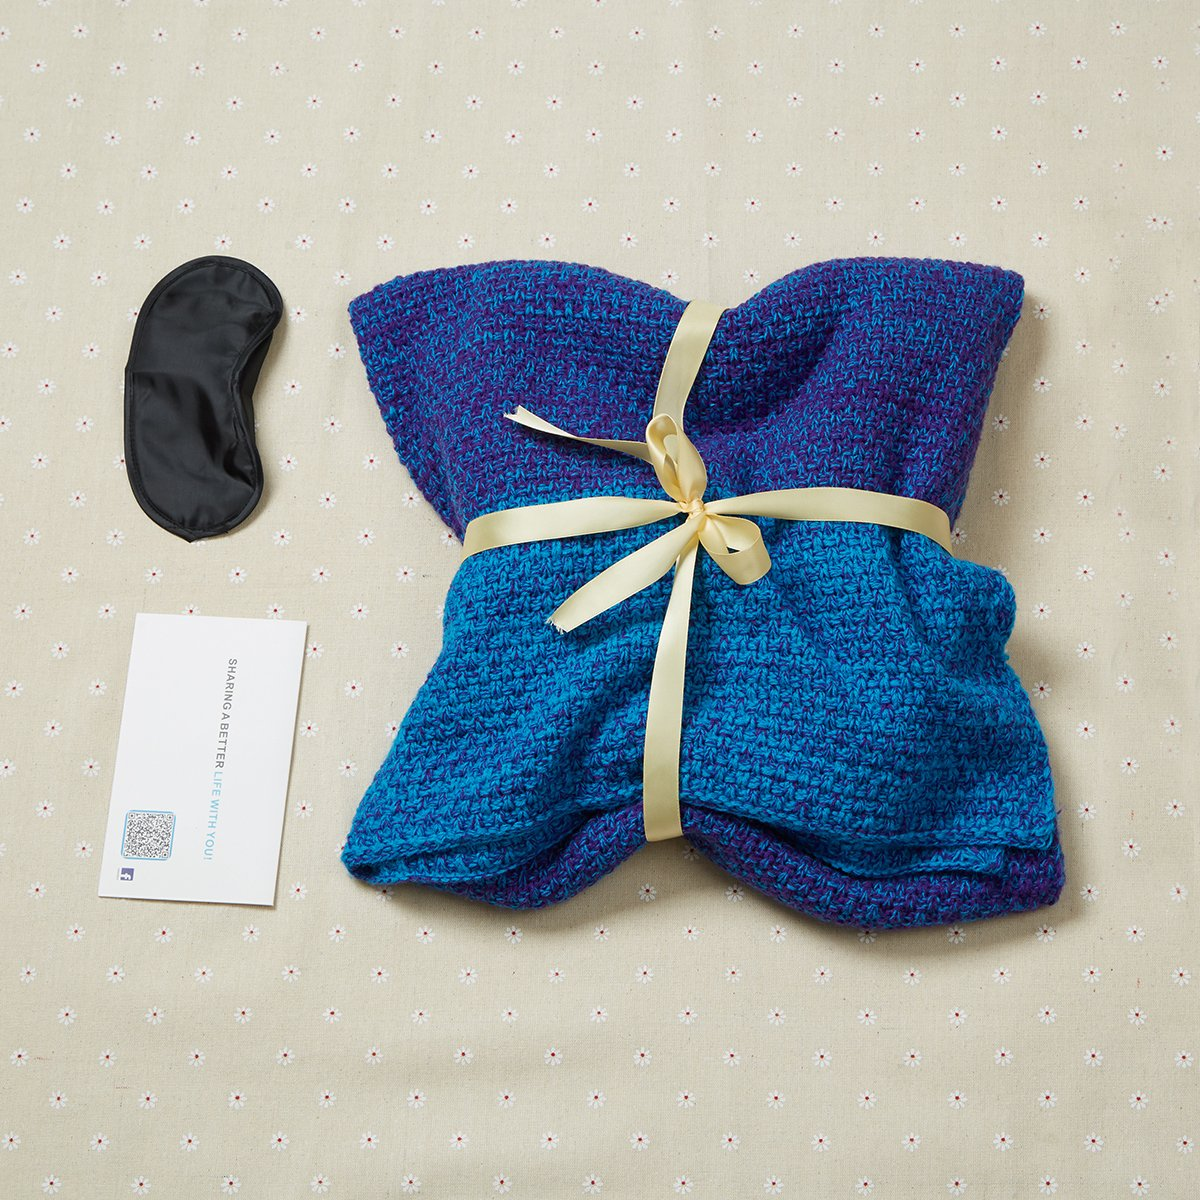 Hollow Out dise/ño Footed cerrado c/álido saco de dormir regalo con ojo m/áscara para adultos Cola de sirena manta